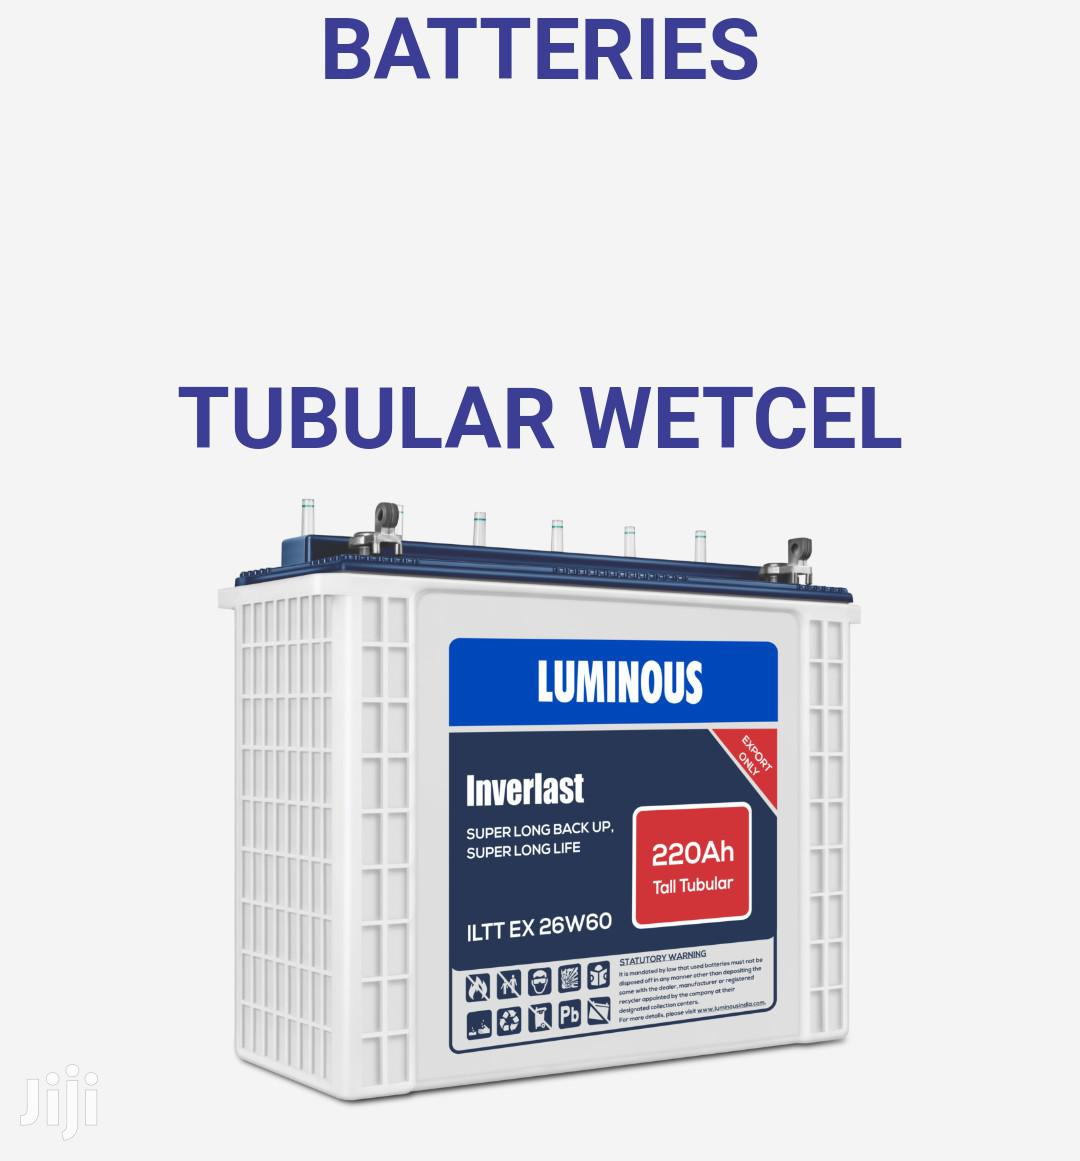 Luminious Tubular 220ah 12v Tubular Battery